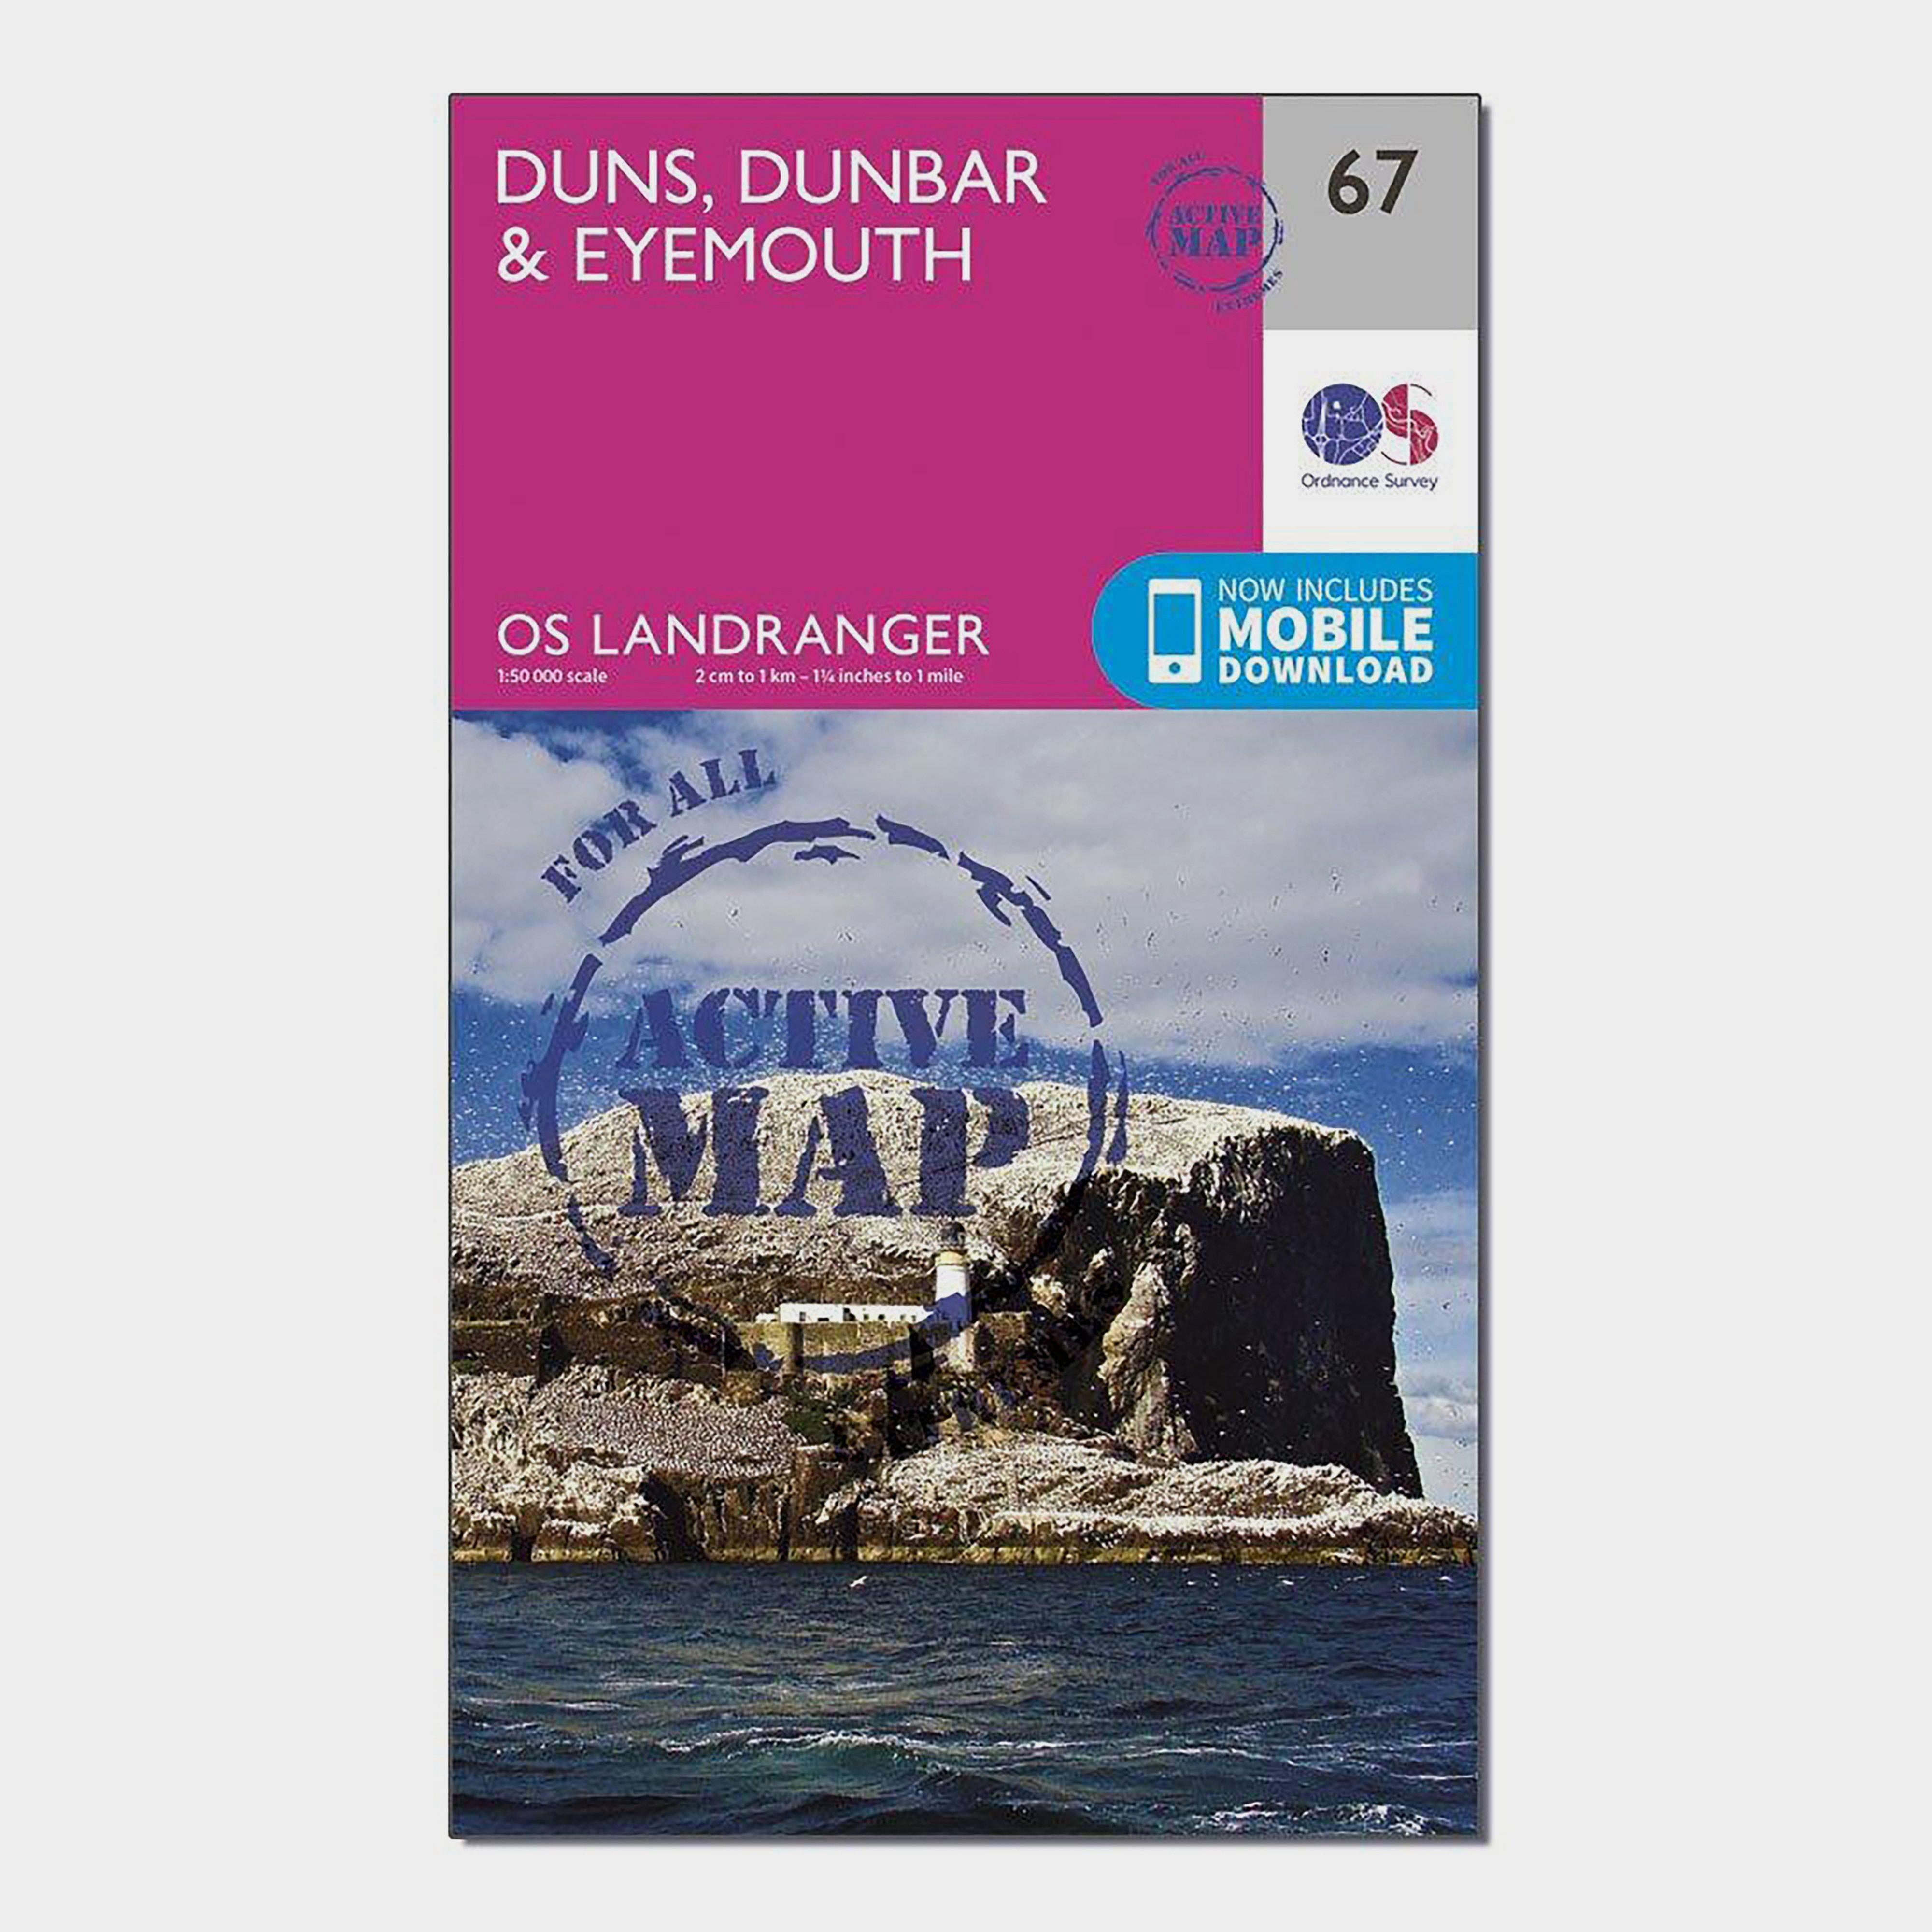 Ordnance Survey Ordnance Survey Landranger Active 67 Duns, Dunbar & Eyemouth Map With Digital Version - Orange, Orange